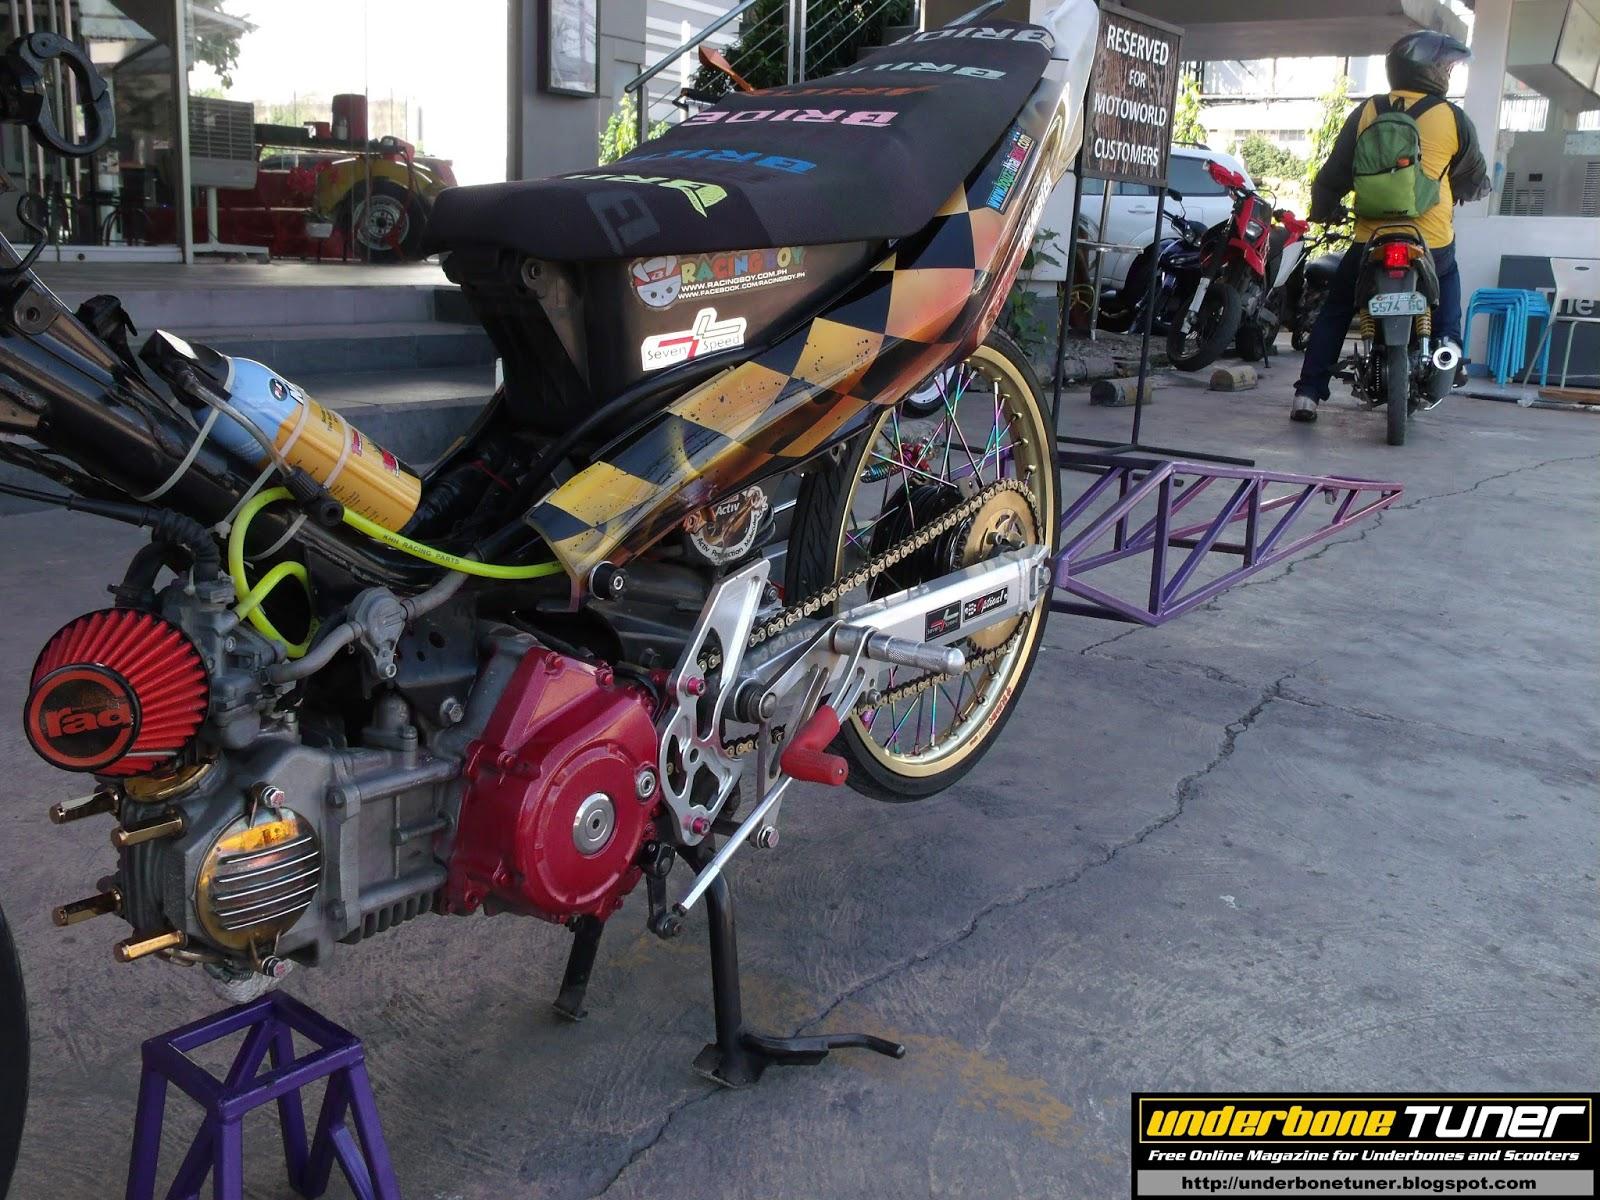 Underbone Tuner: Thai Style Yamaha Vega Force Dragster